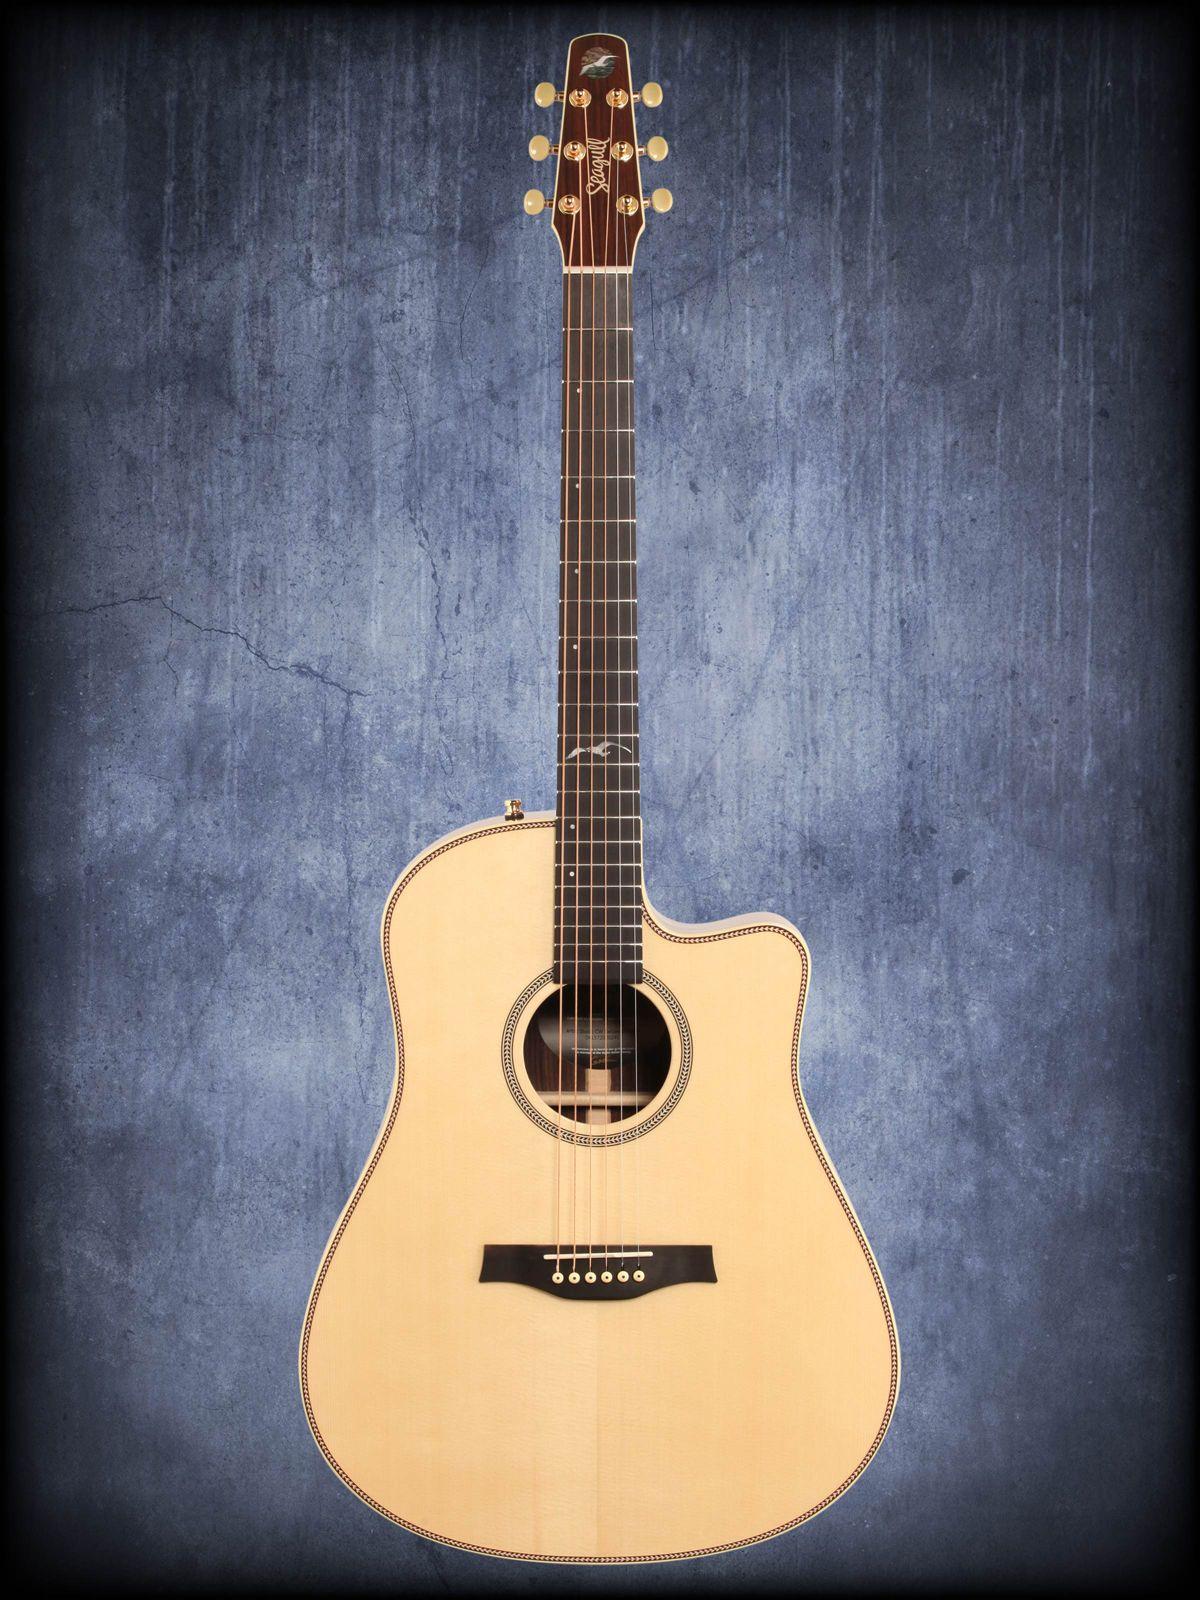 Seagull artist studio cutaway acoustic electric guitar